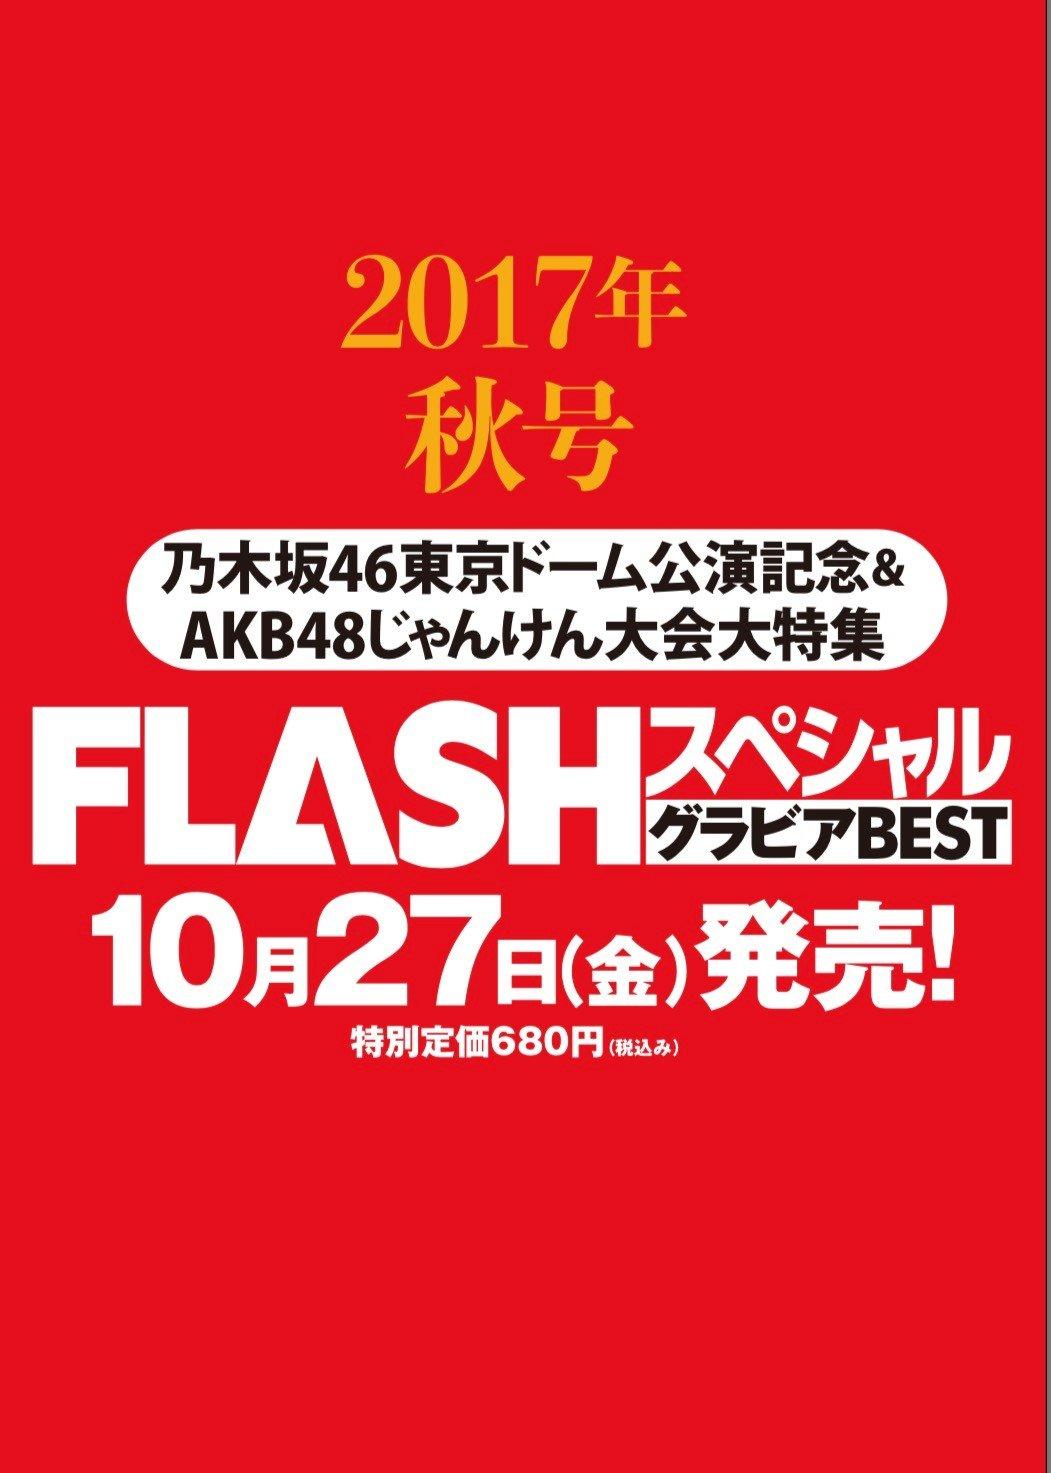 FLASHスペシャルグラビアBEST 2017秋号